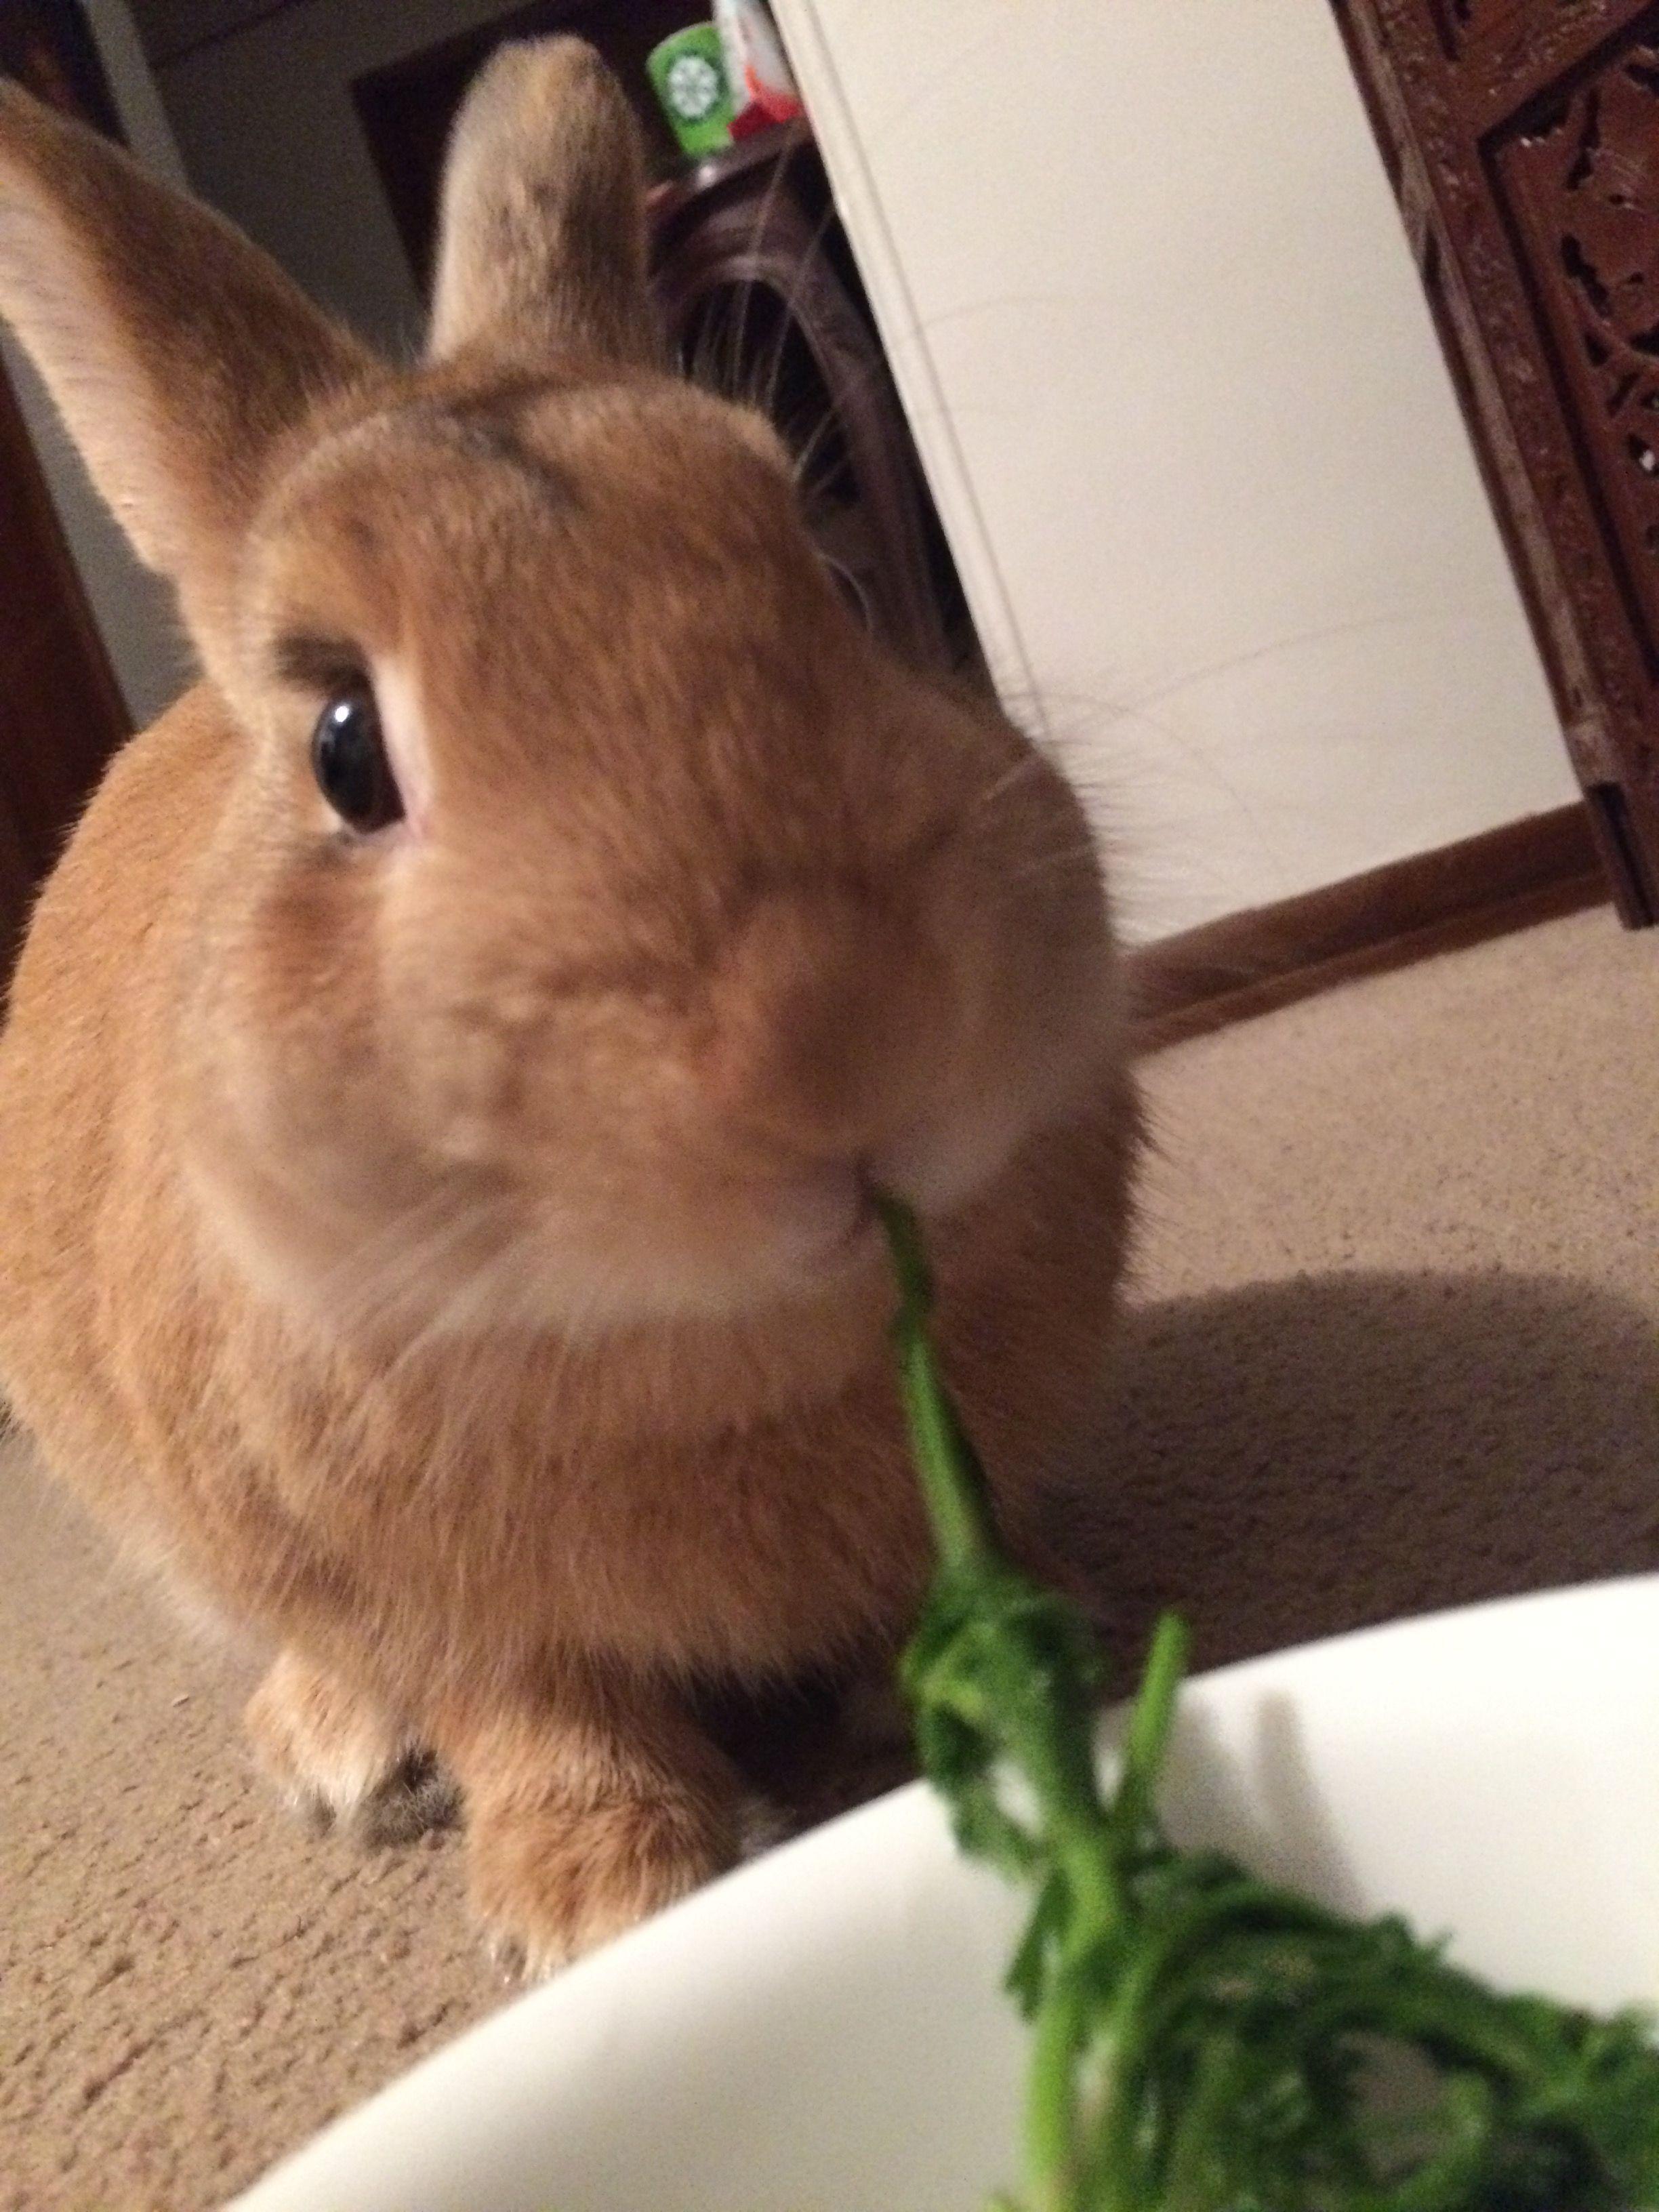 Pin By Edie Wallace On Bunnies Cute Bunny Sweet Animals Dutch Rabbit